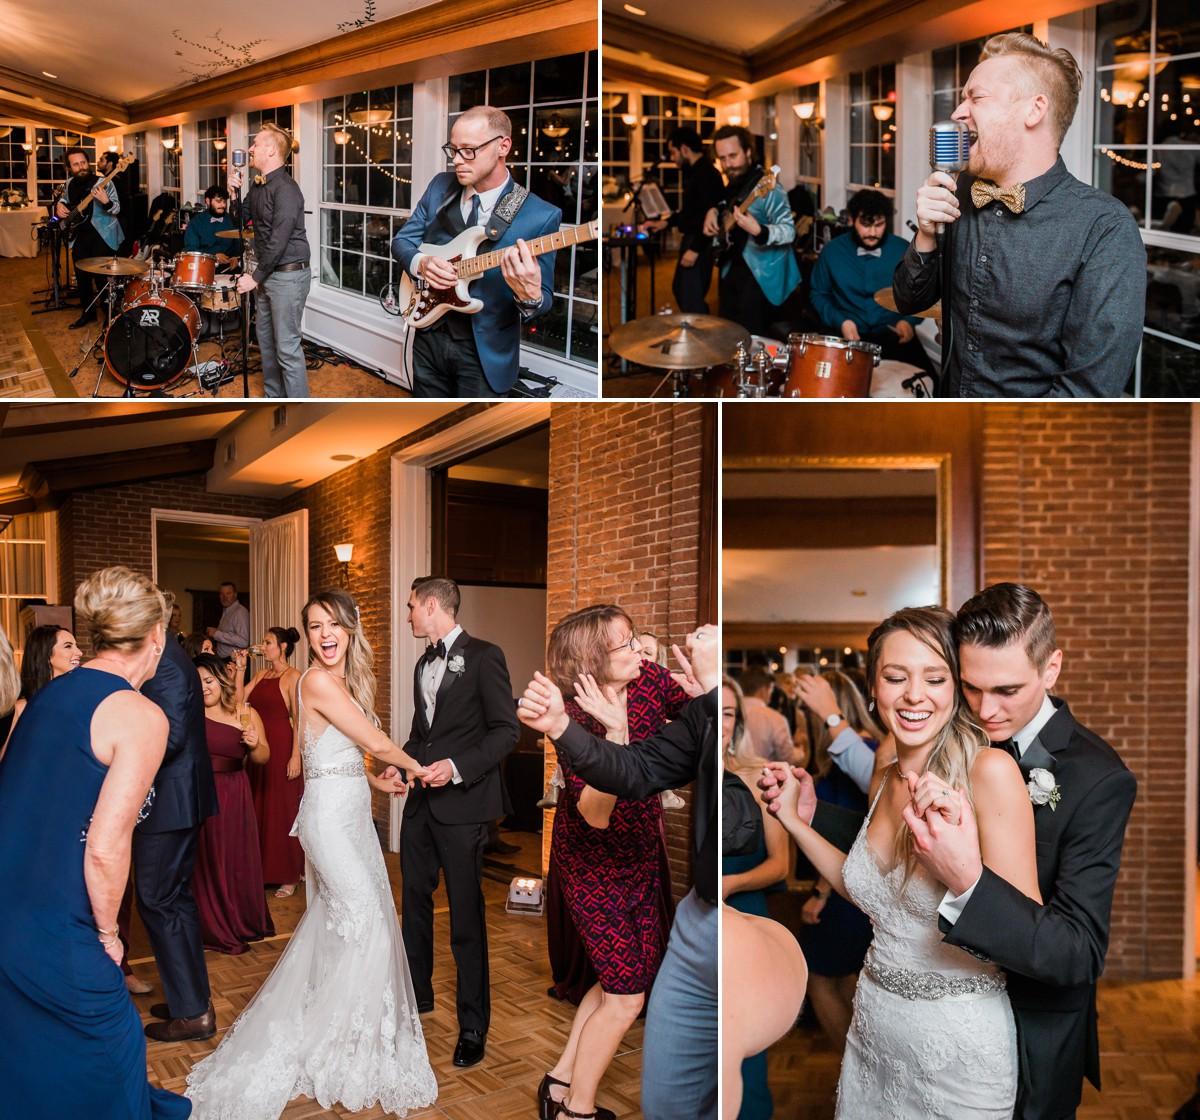 Houston Hotel Wedding Photo by Nate Messarra